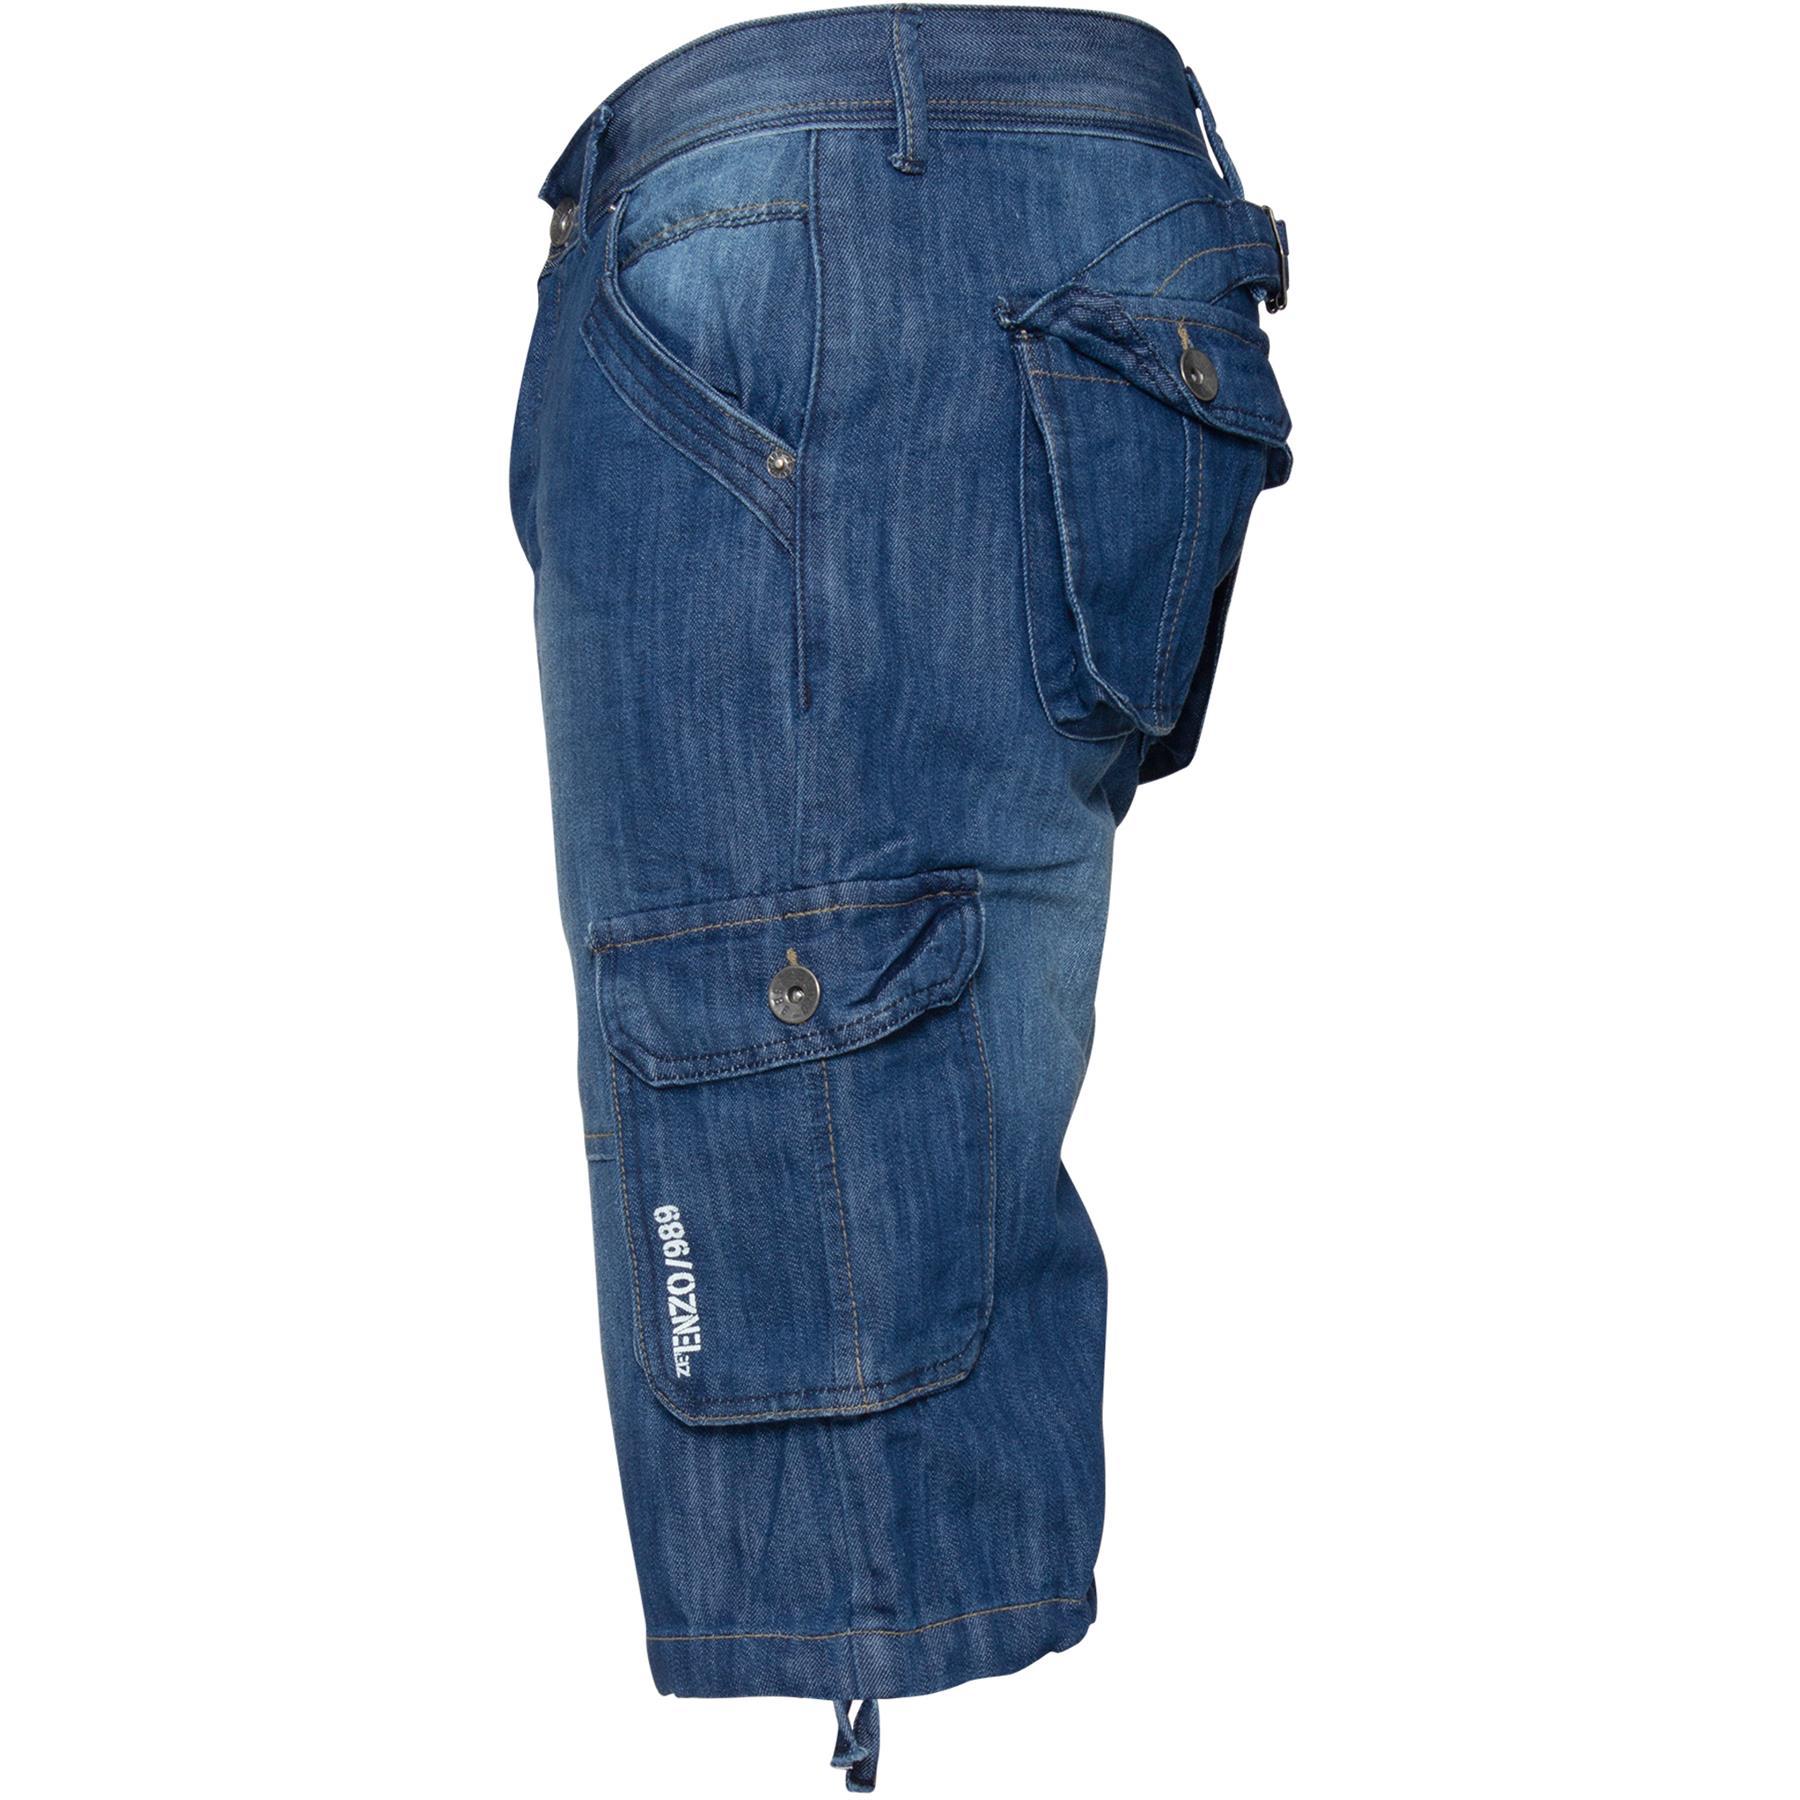 ENZO-Jeans-para-hombre-de-carga-combate-informal-de-verano-Shorts-Pantalones-Cortos-de-Jeans-Todas miniatura 4